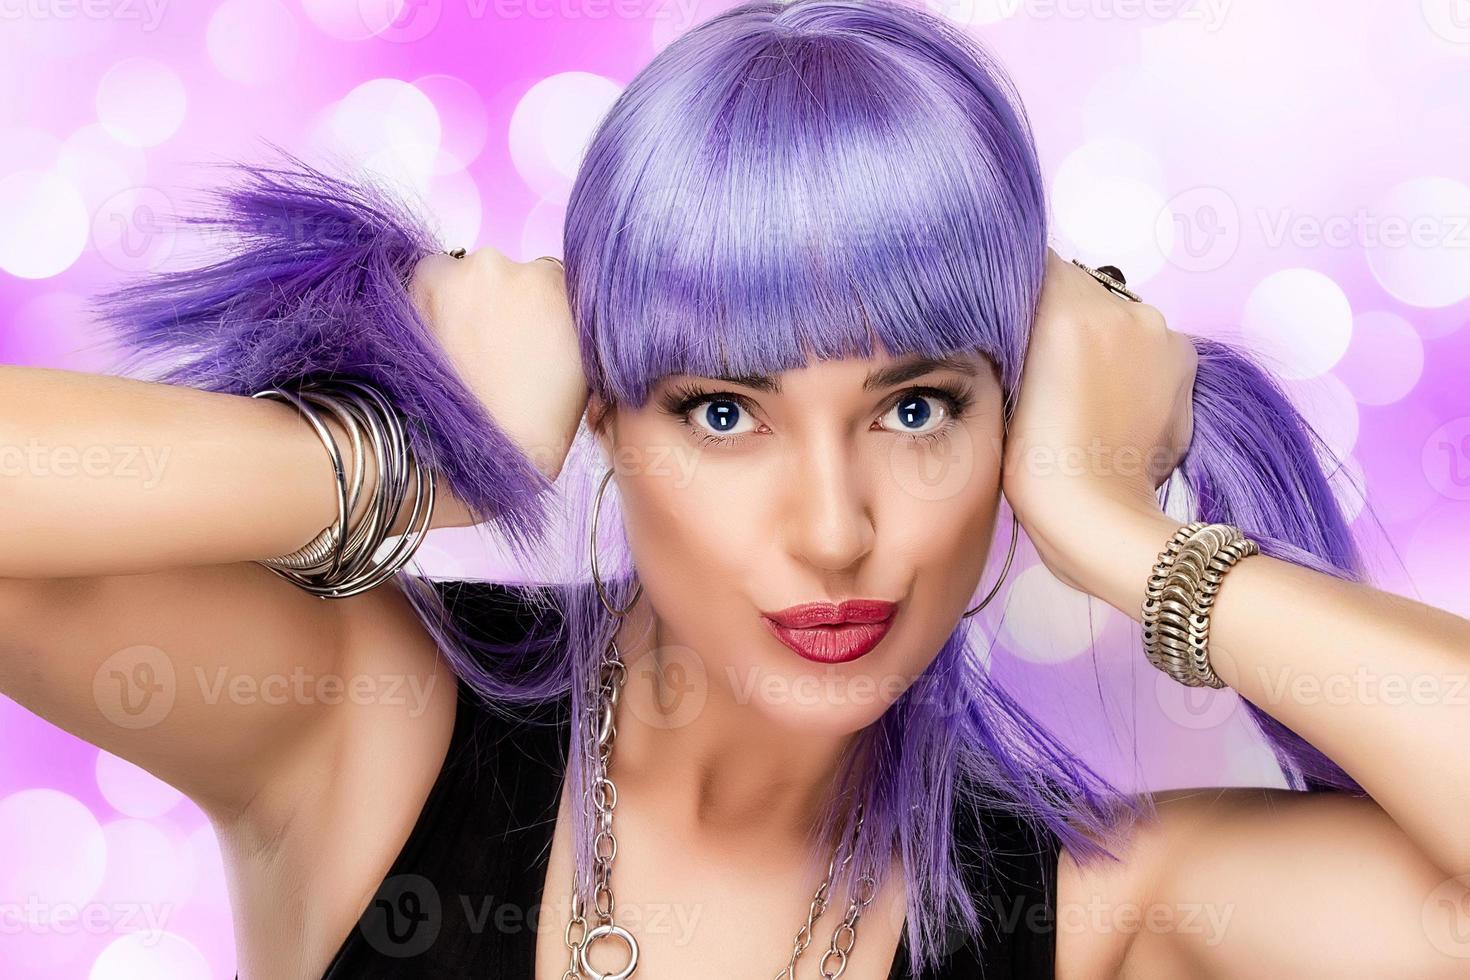 belleza chica alegre. elegante cabello morado foto